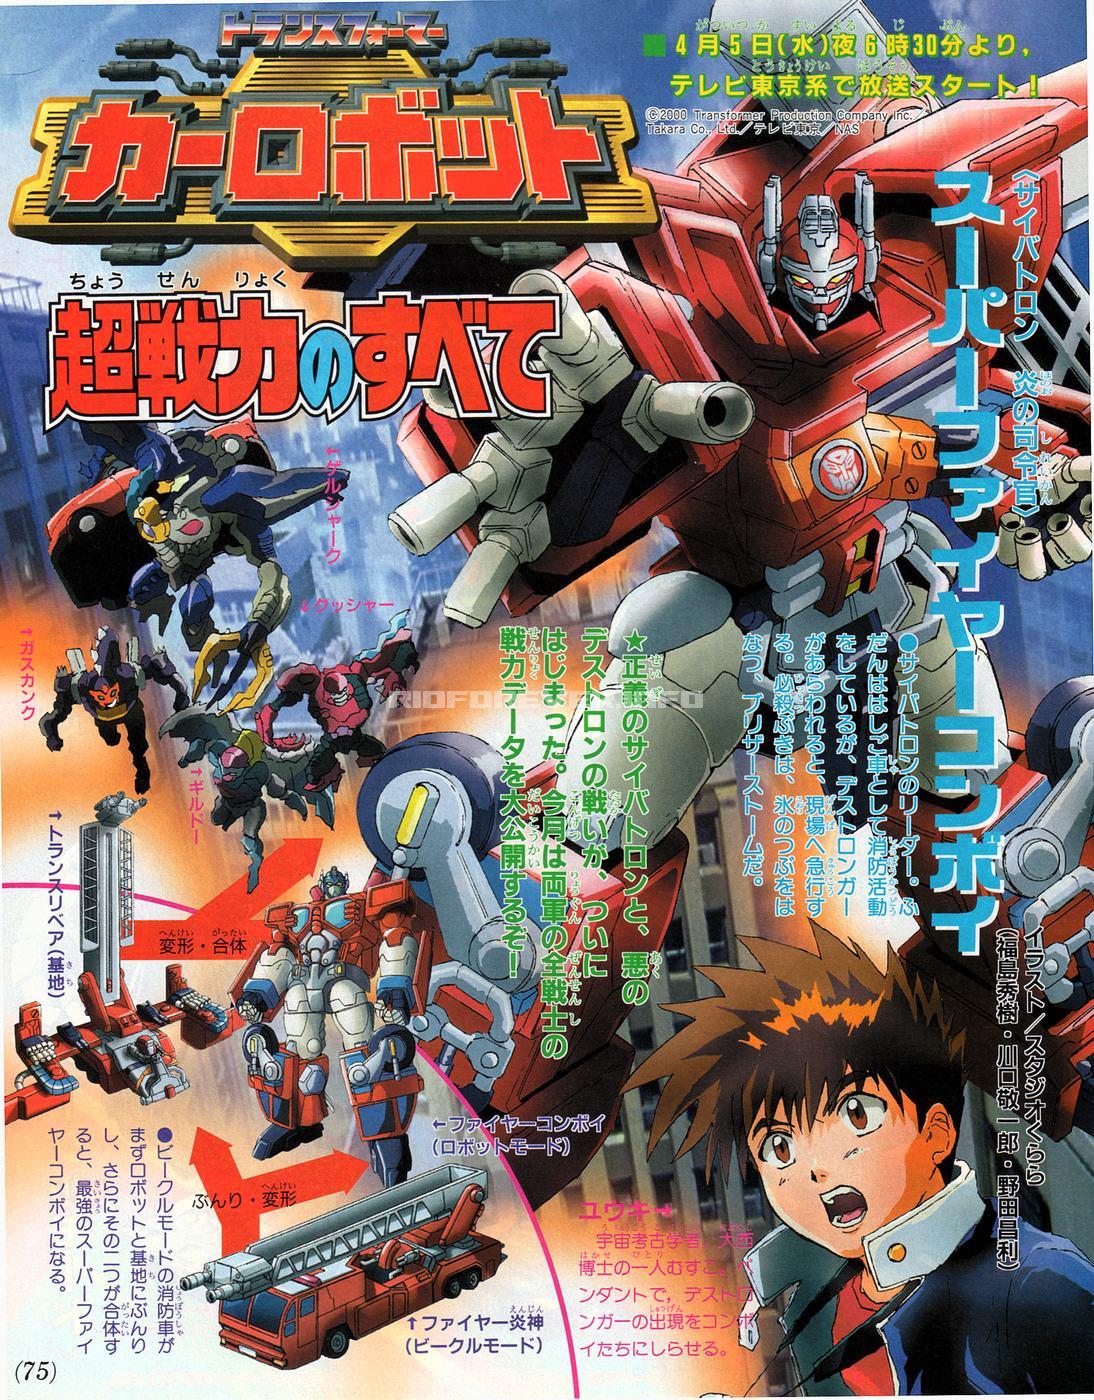 TV Magazine 2000-05-6